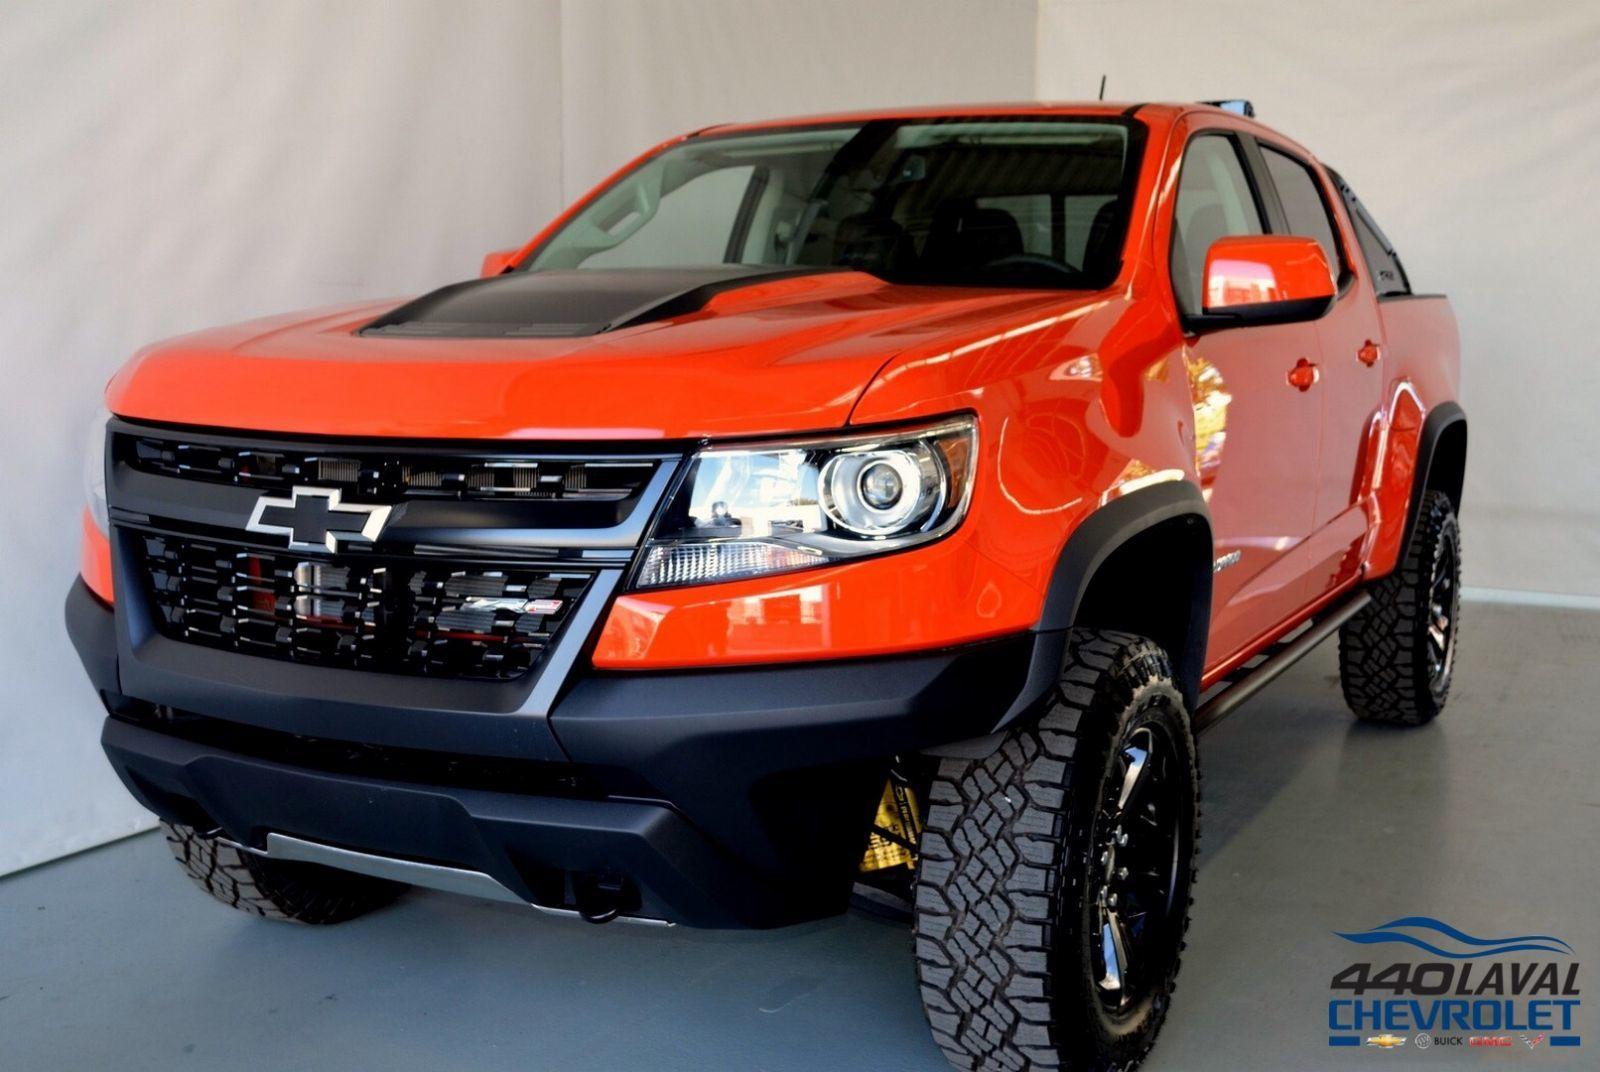 New 2019 Chevrolet Colorado ZR2, Crew Cab Crush - $53940.0 ...